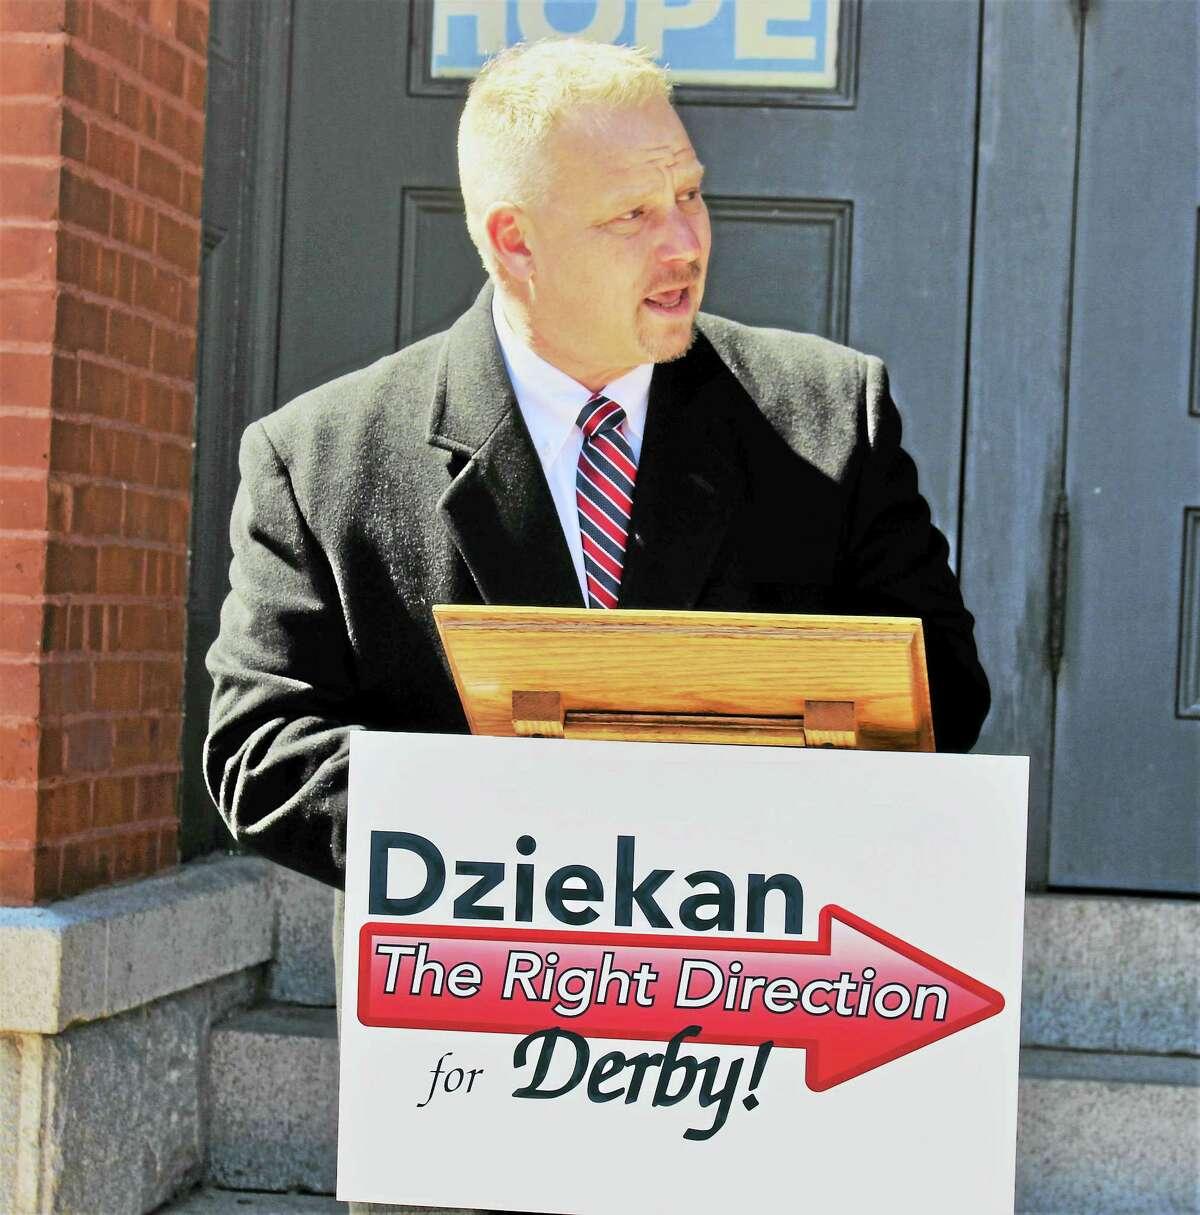 Republican Richard Dziekan announces Wednesday he will run for mayor of Derby.